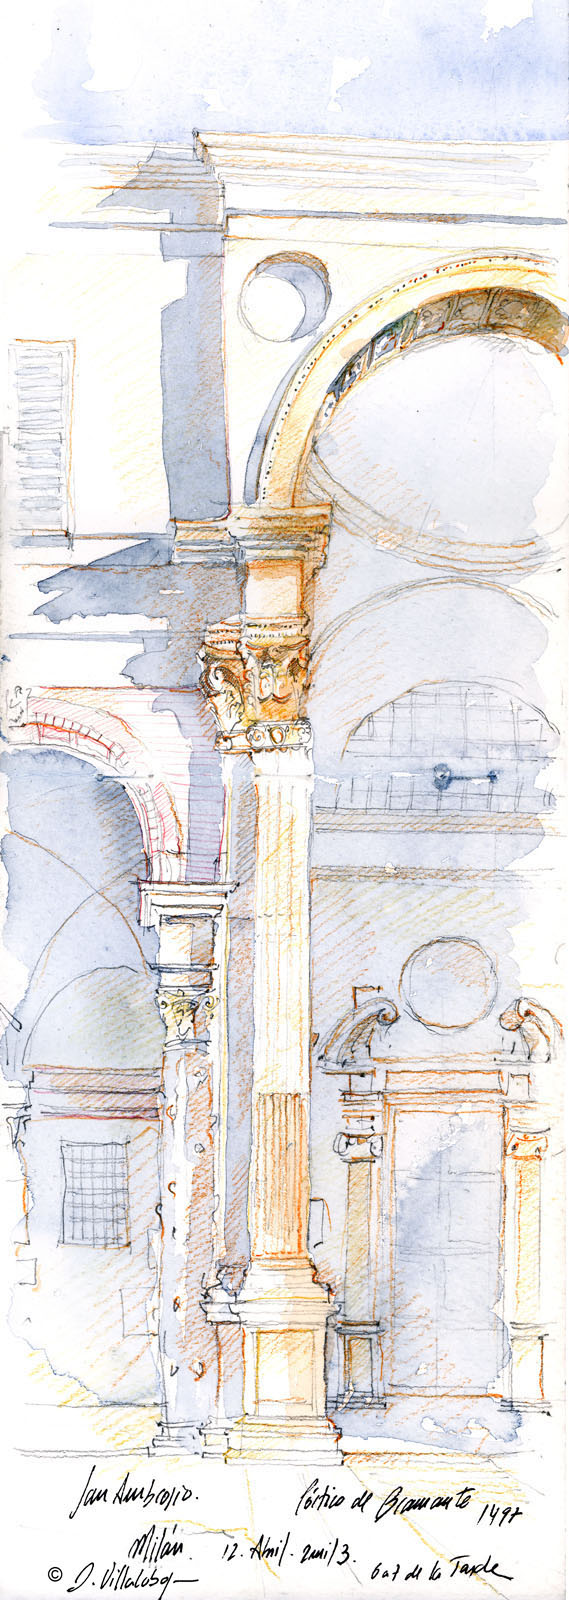 danielvillalobos-sketchbooks-skechtravelsexhibition-12